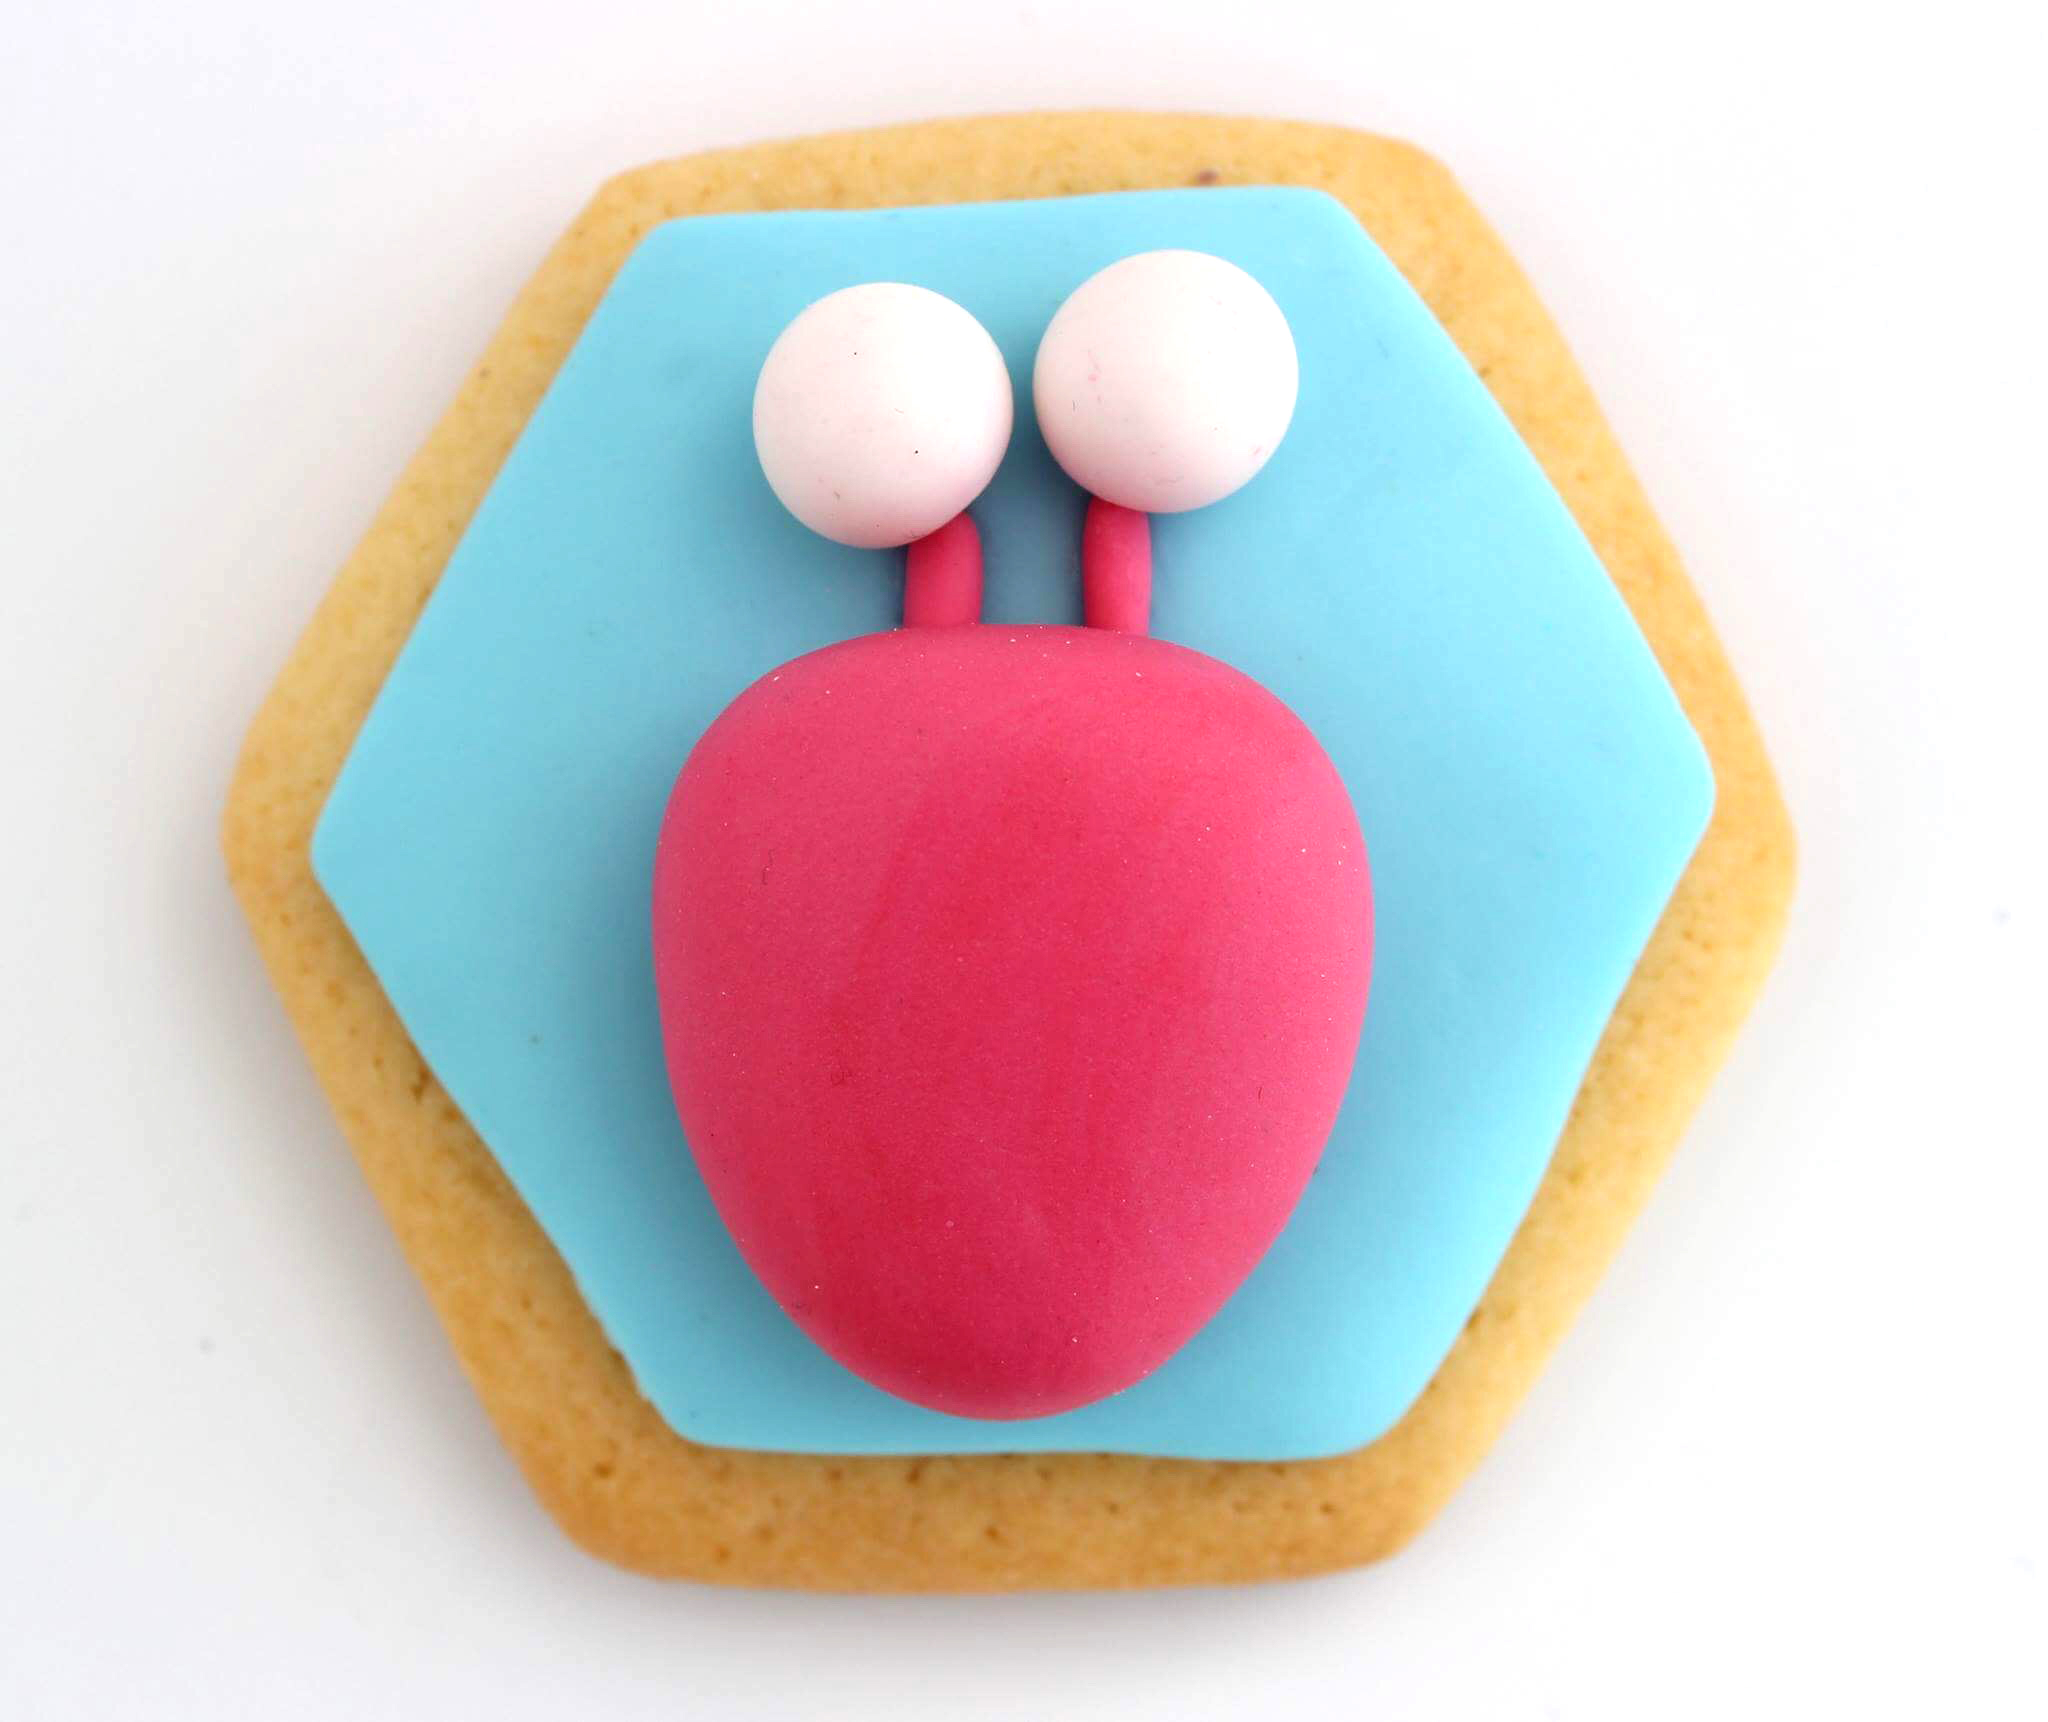 sff17_CrabTutorial-Monique-Ascanelli-The-Cake-Topper-Step2.JPG#asset:17073